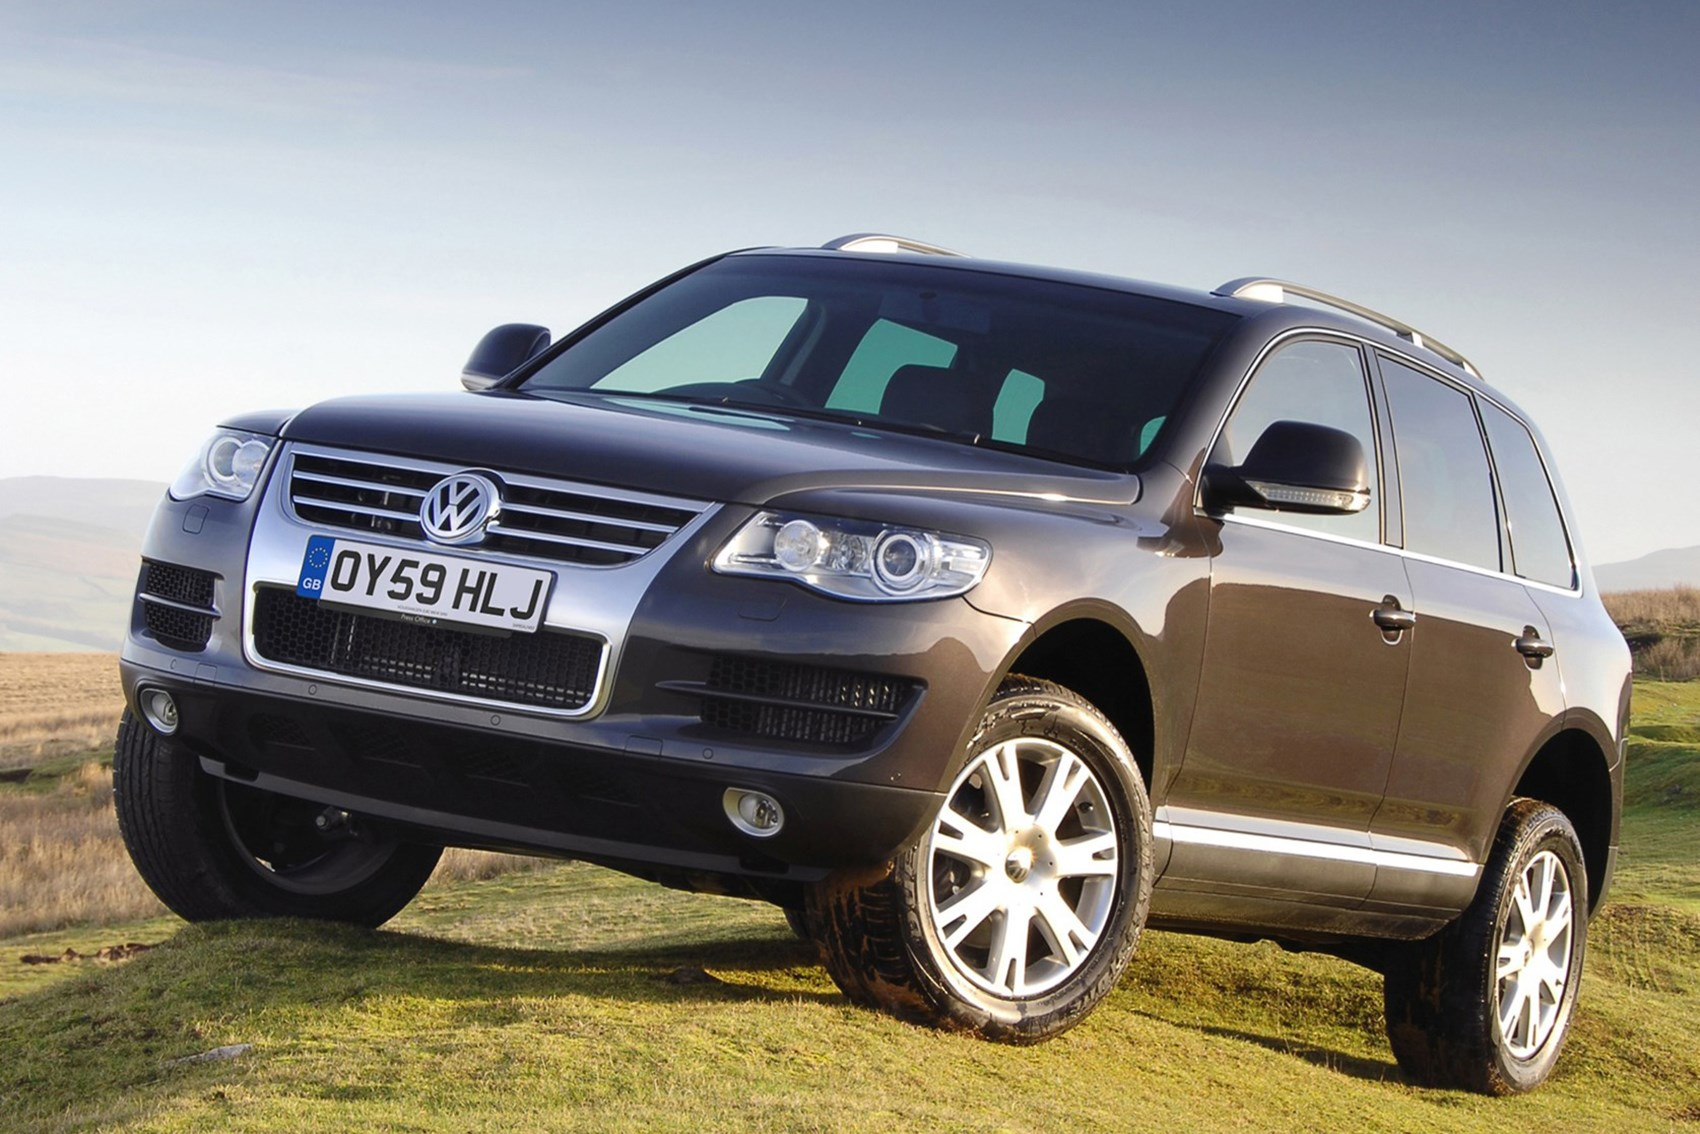 VW Touareg - luxury cars for less than £10k